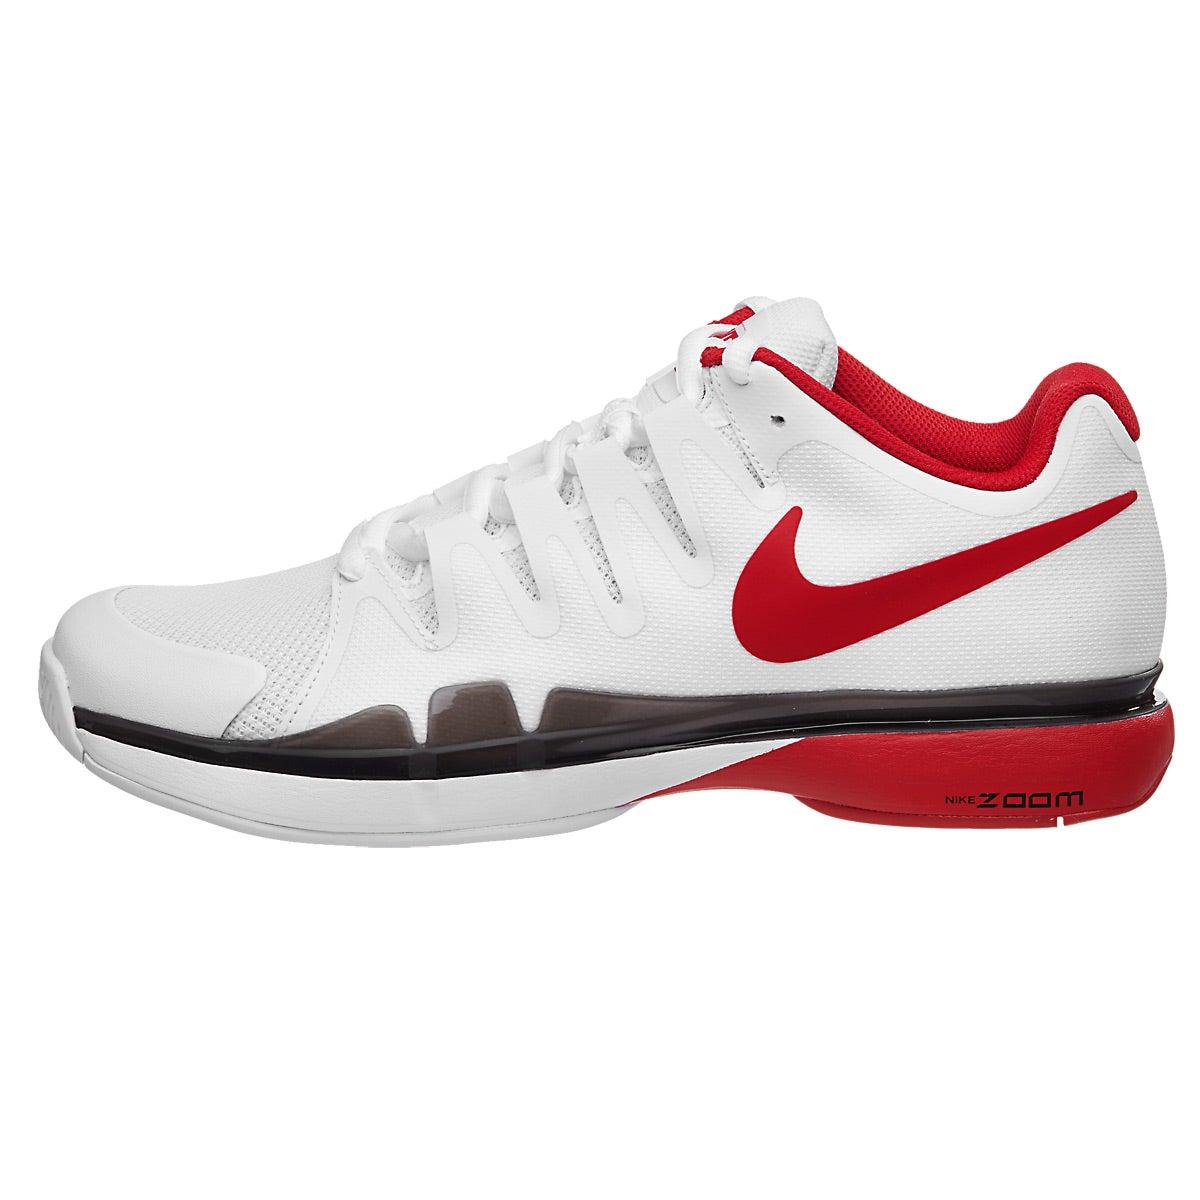 Tennis Shoe Pic